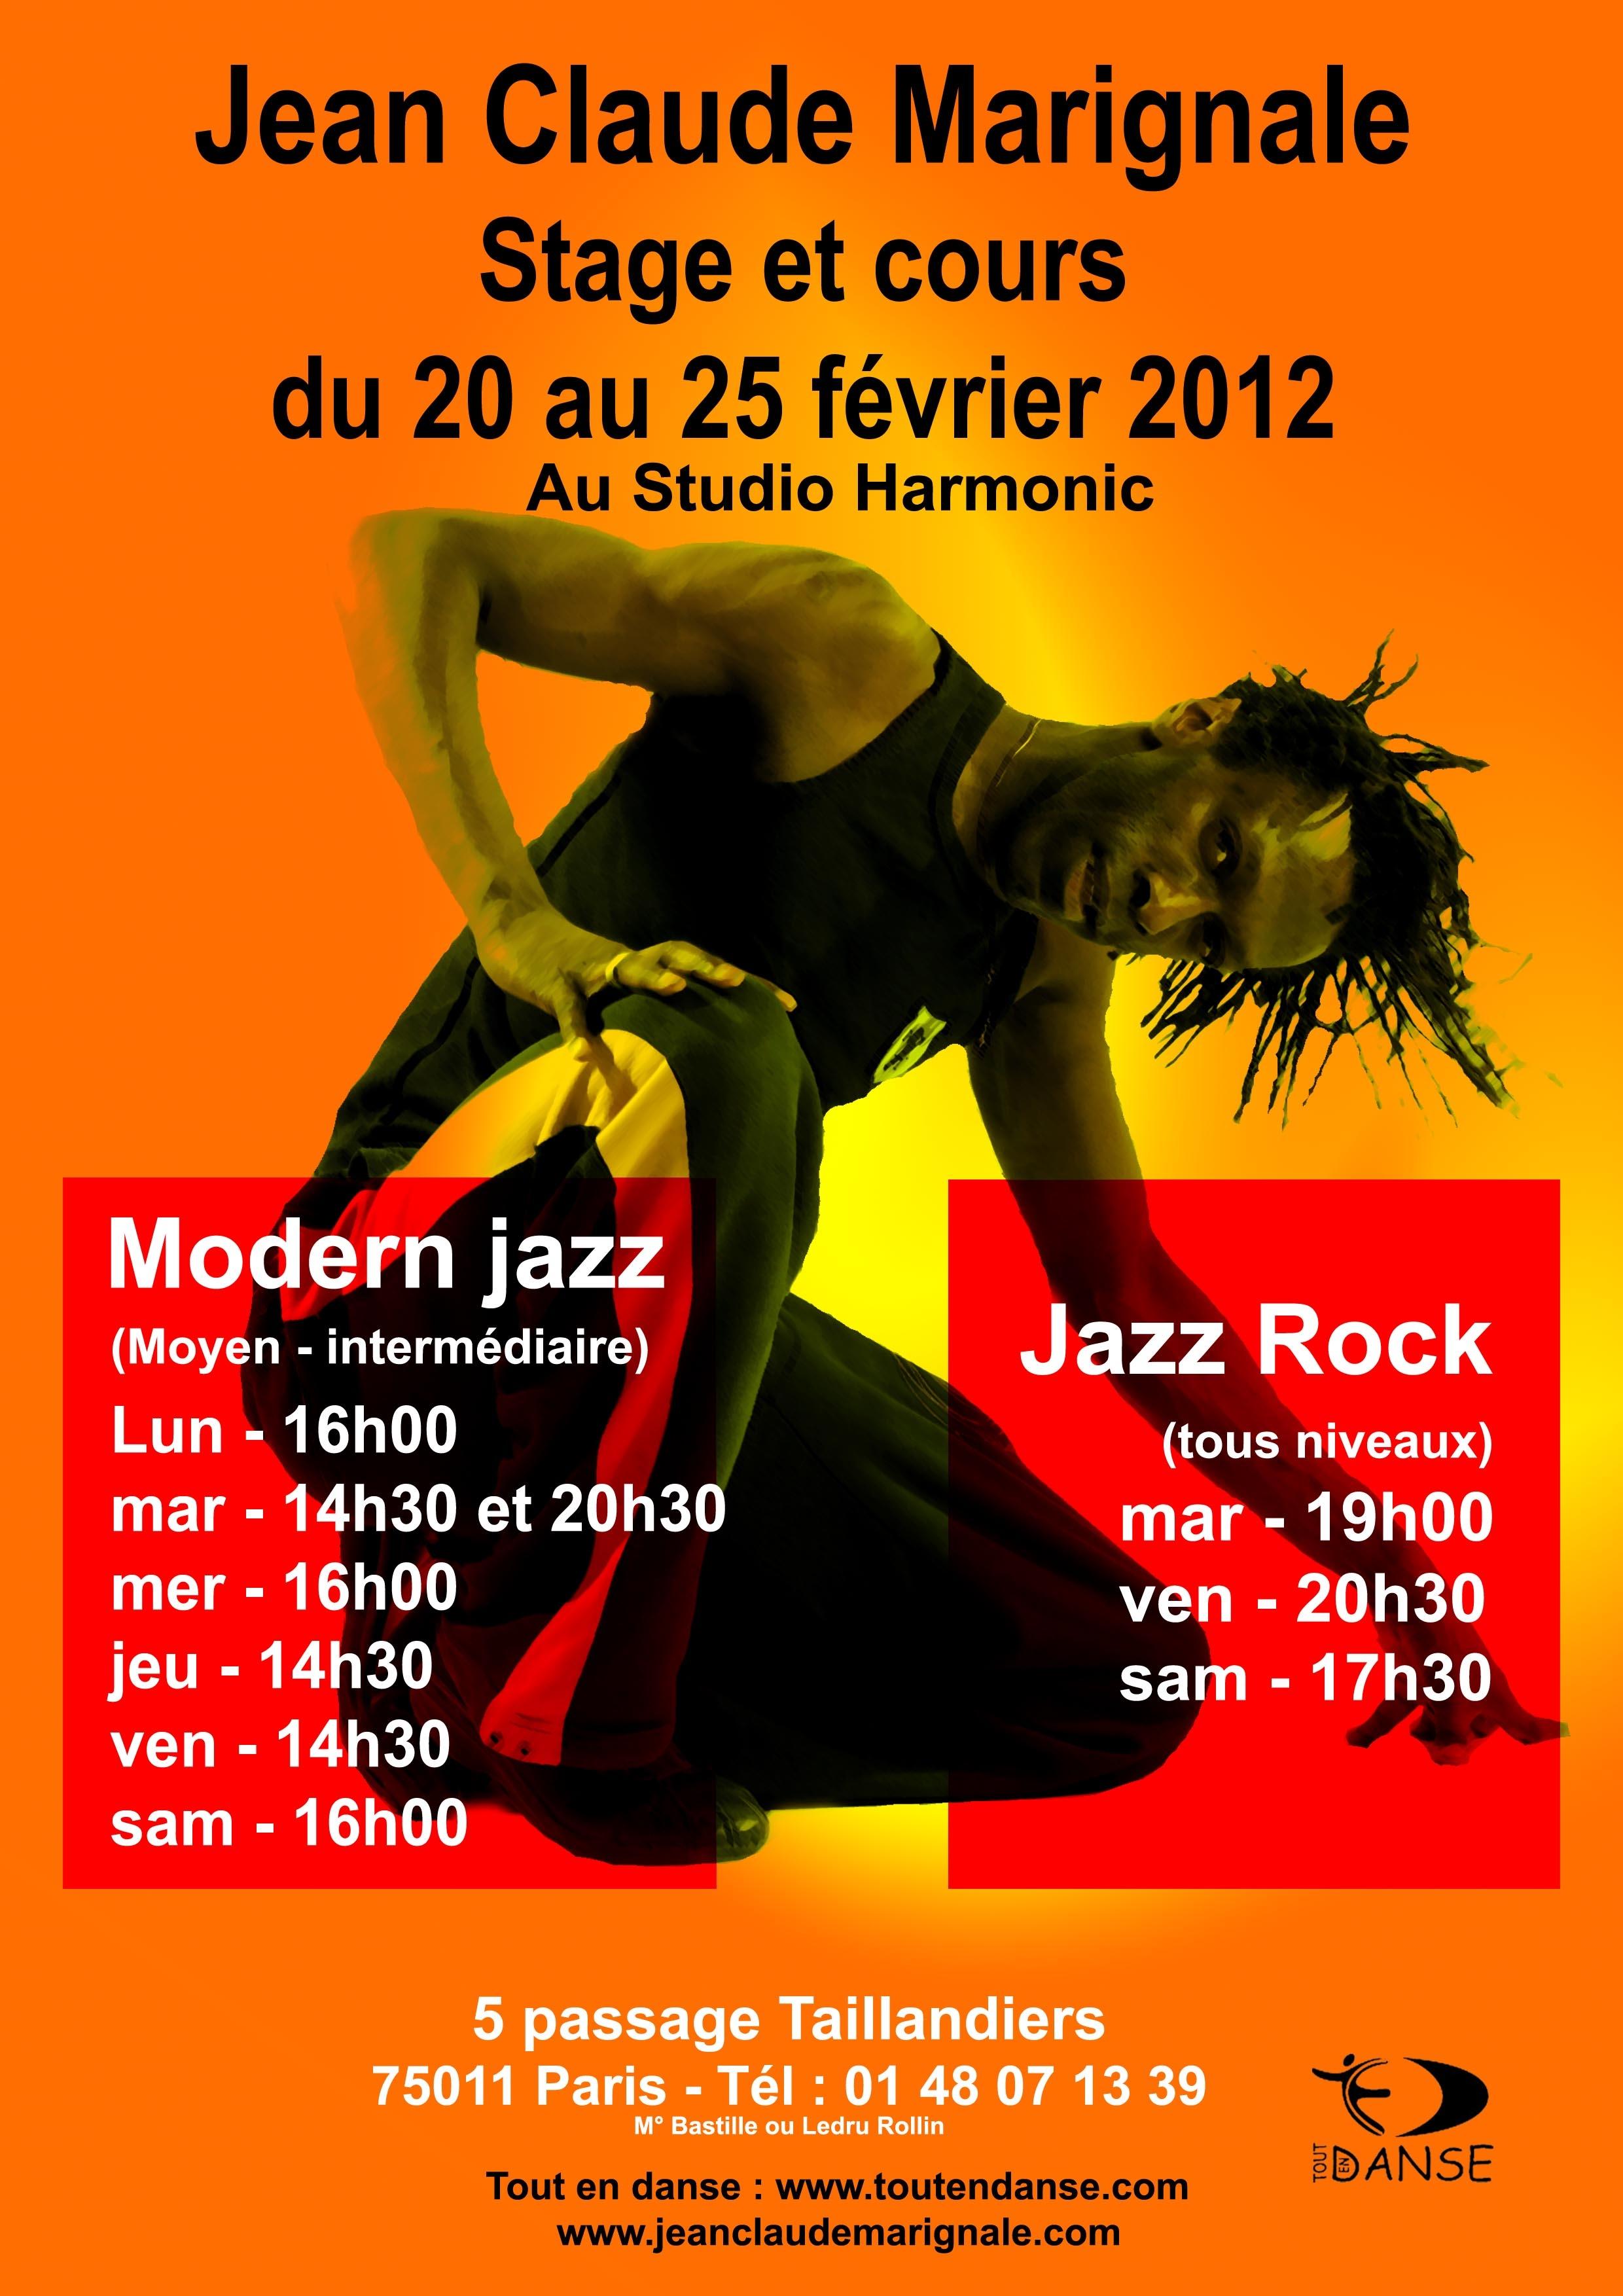 stage-studio-harmonic20-au-25-fevrier-2012-apl.jpg